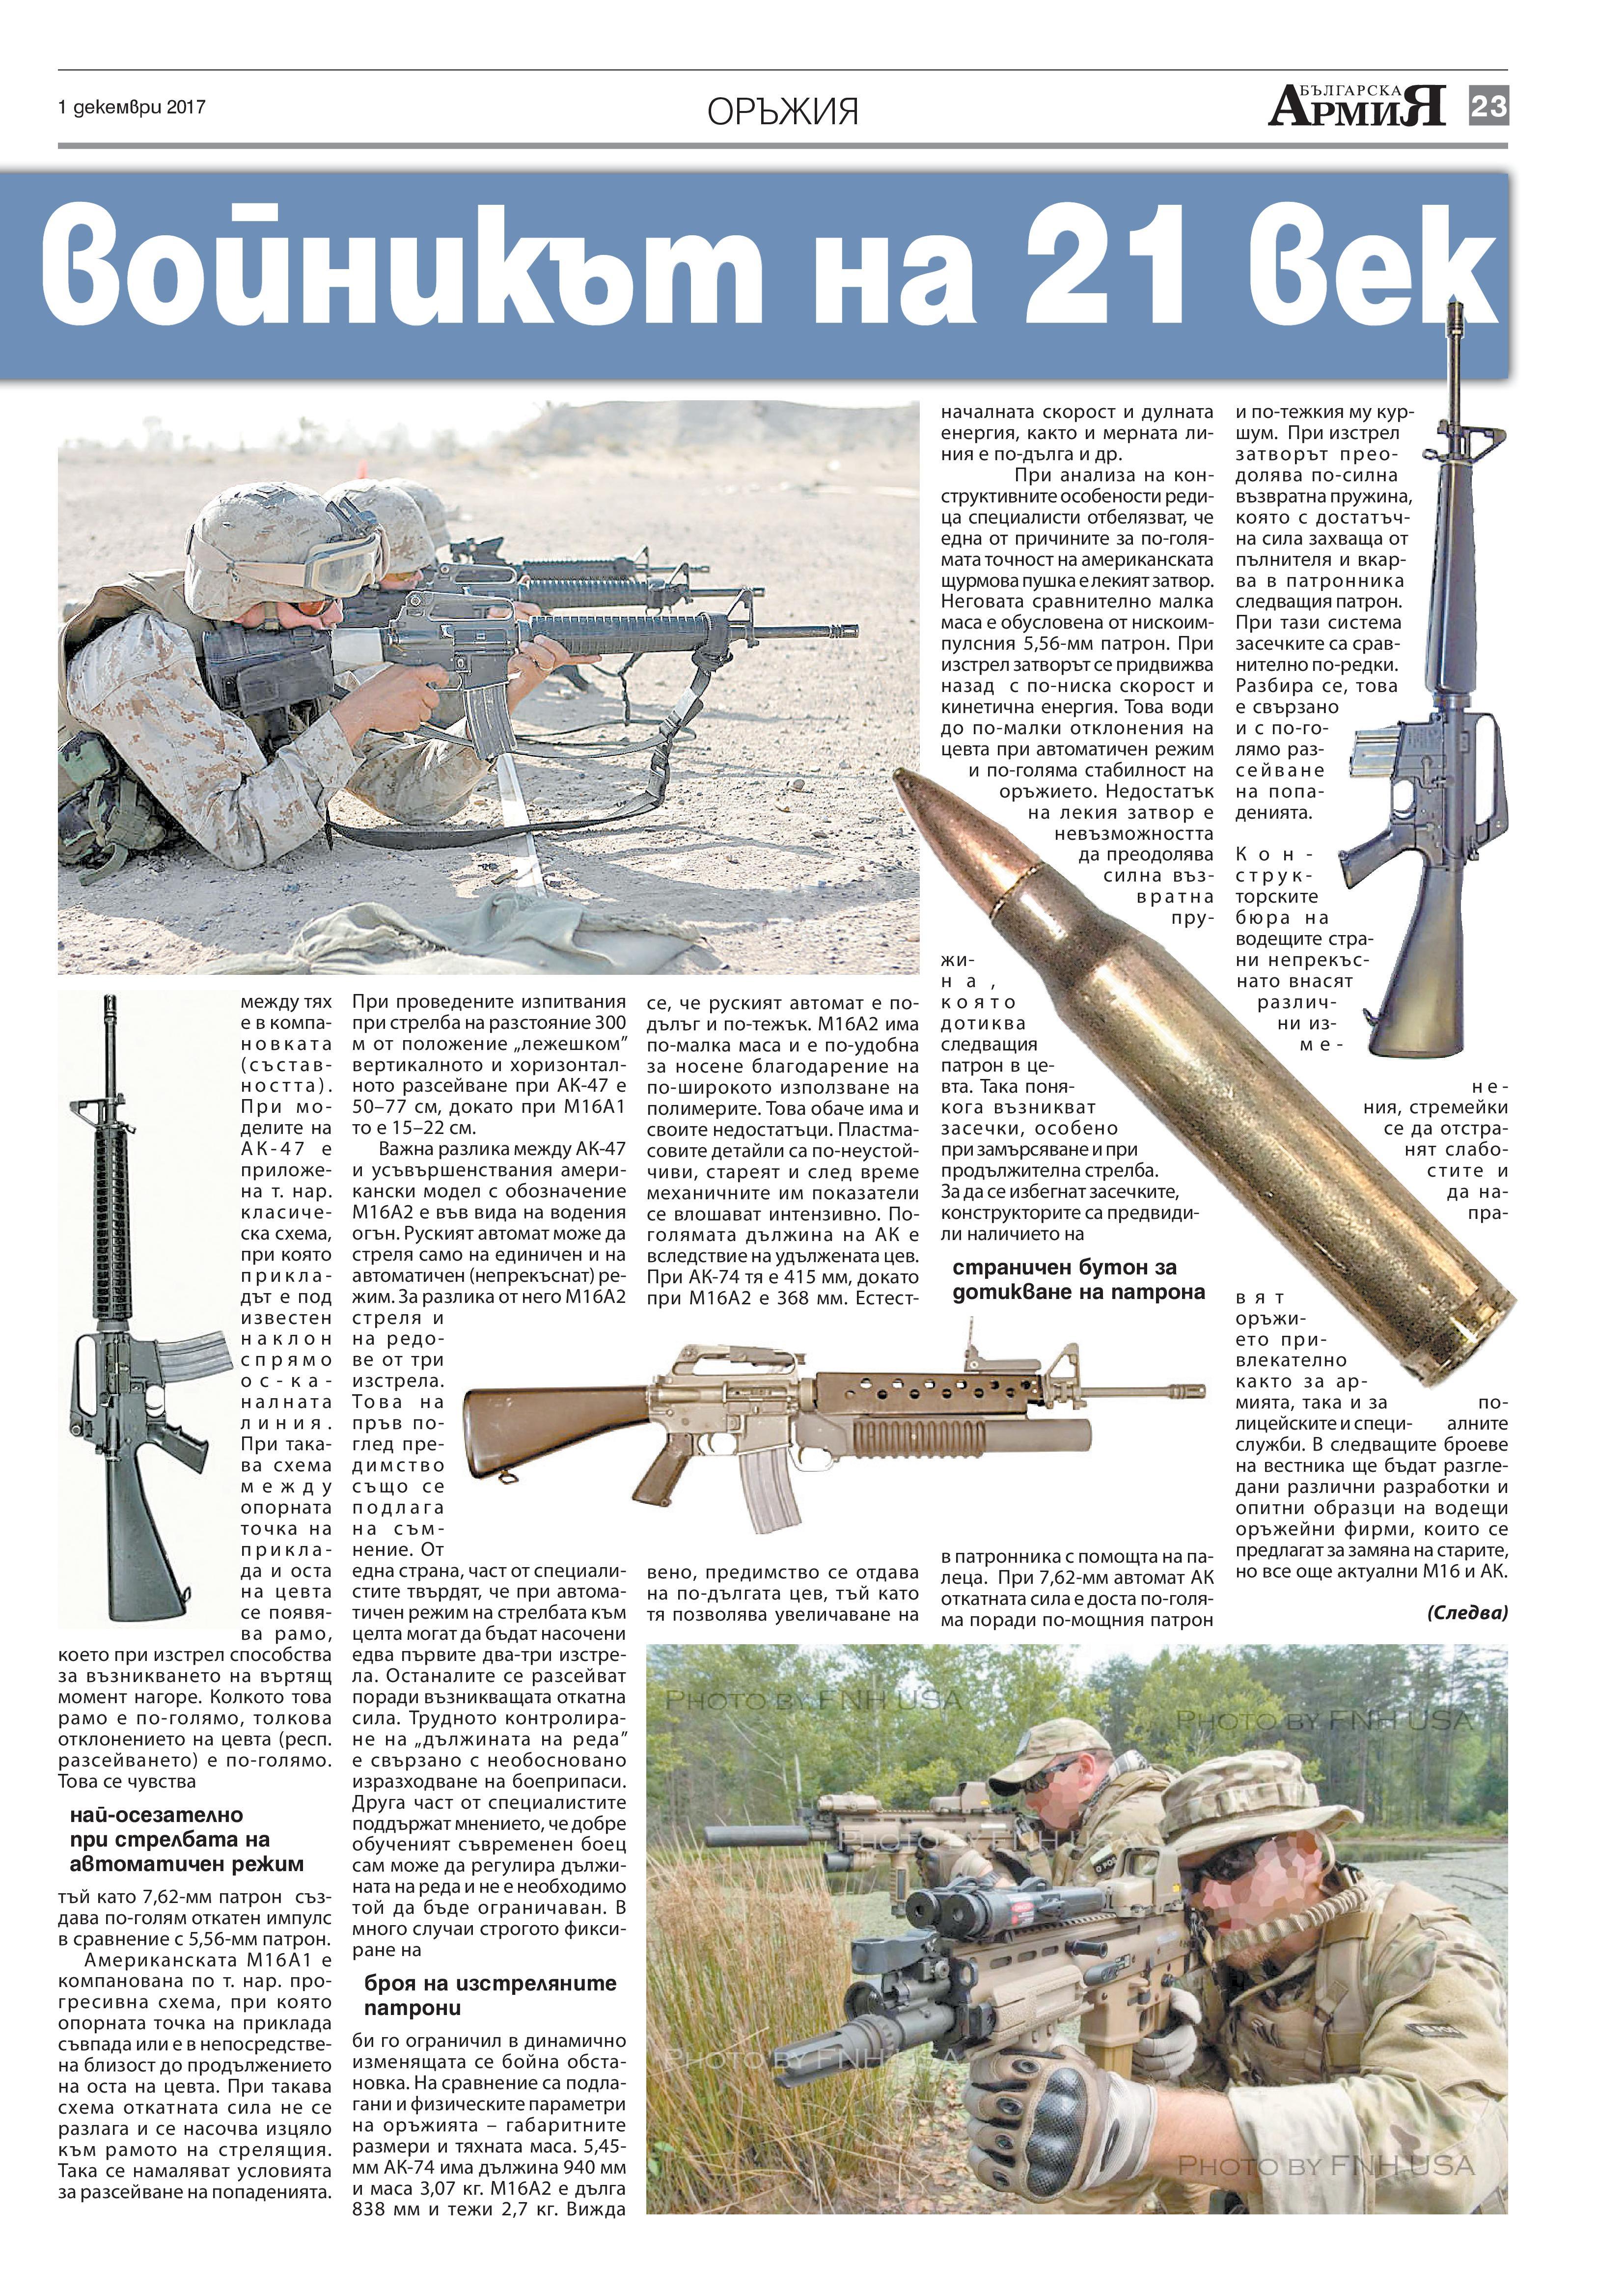 http://armymedia.bg/wp-content/uploads/2015/06/23-14.jpg